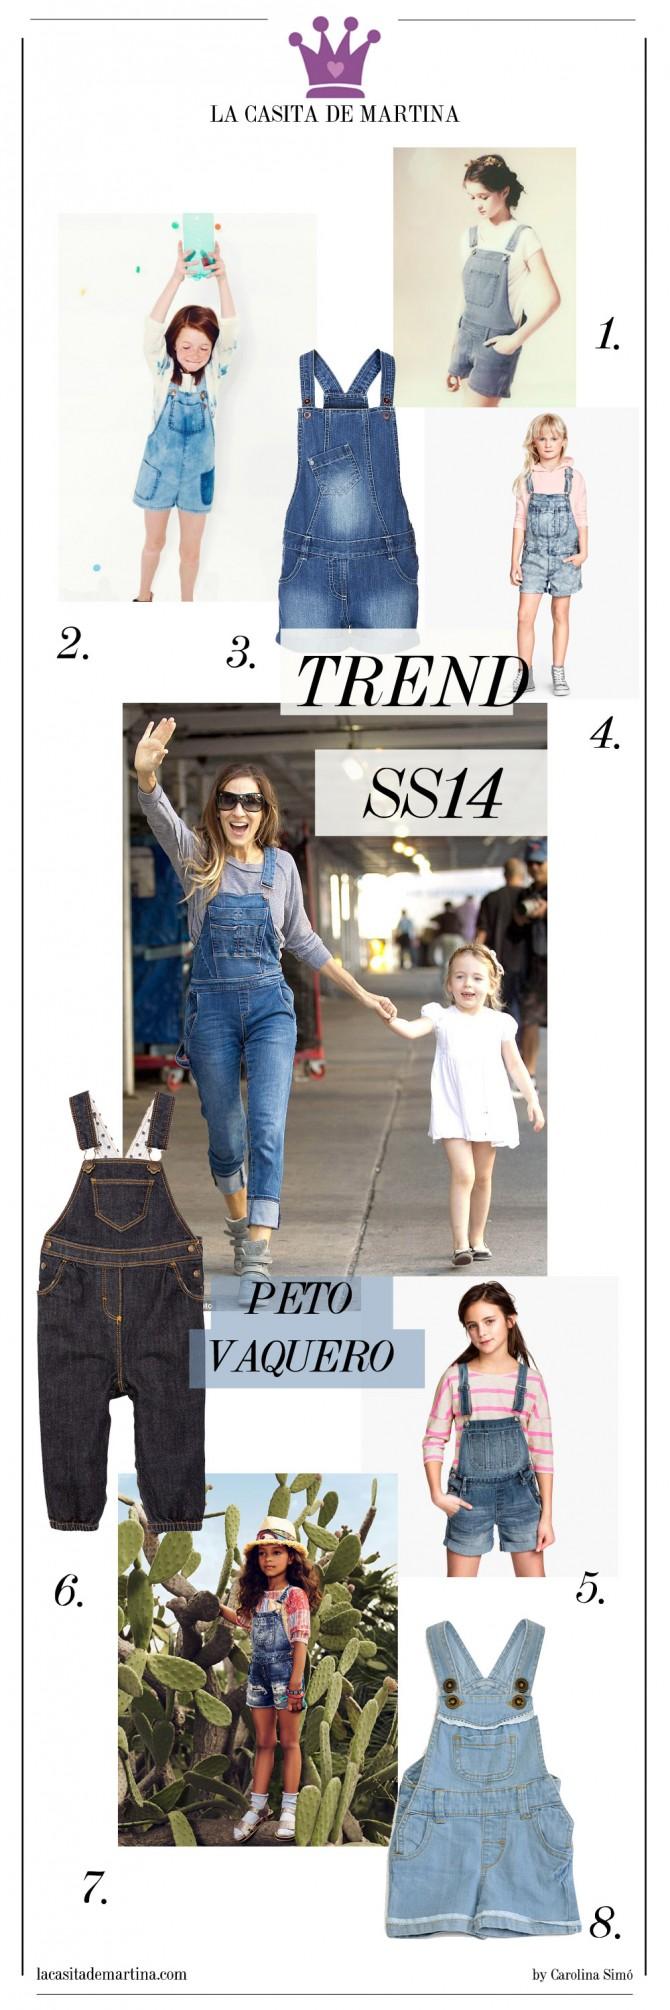 Tendencias moda infantil, Peto vaquero, Mango kids, Zara Kids, Blog de Moda Infantil, La casita de Martina, El Corte Inglés moda infantil